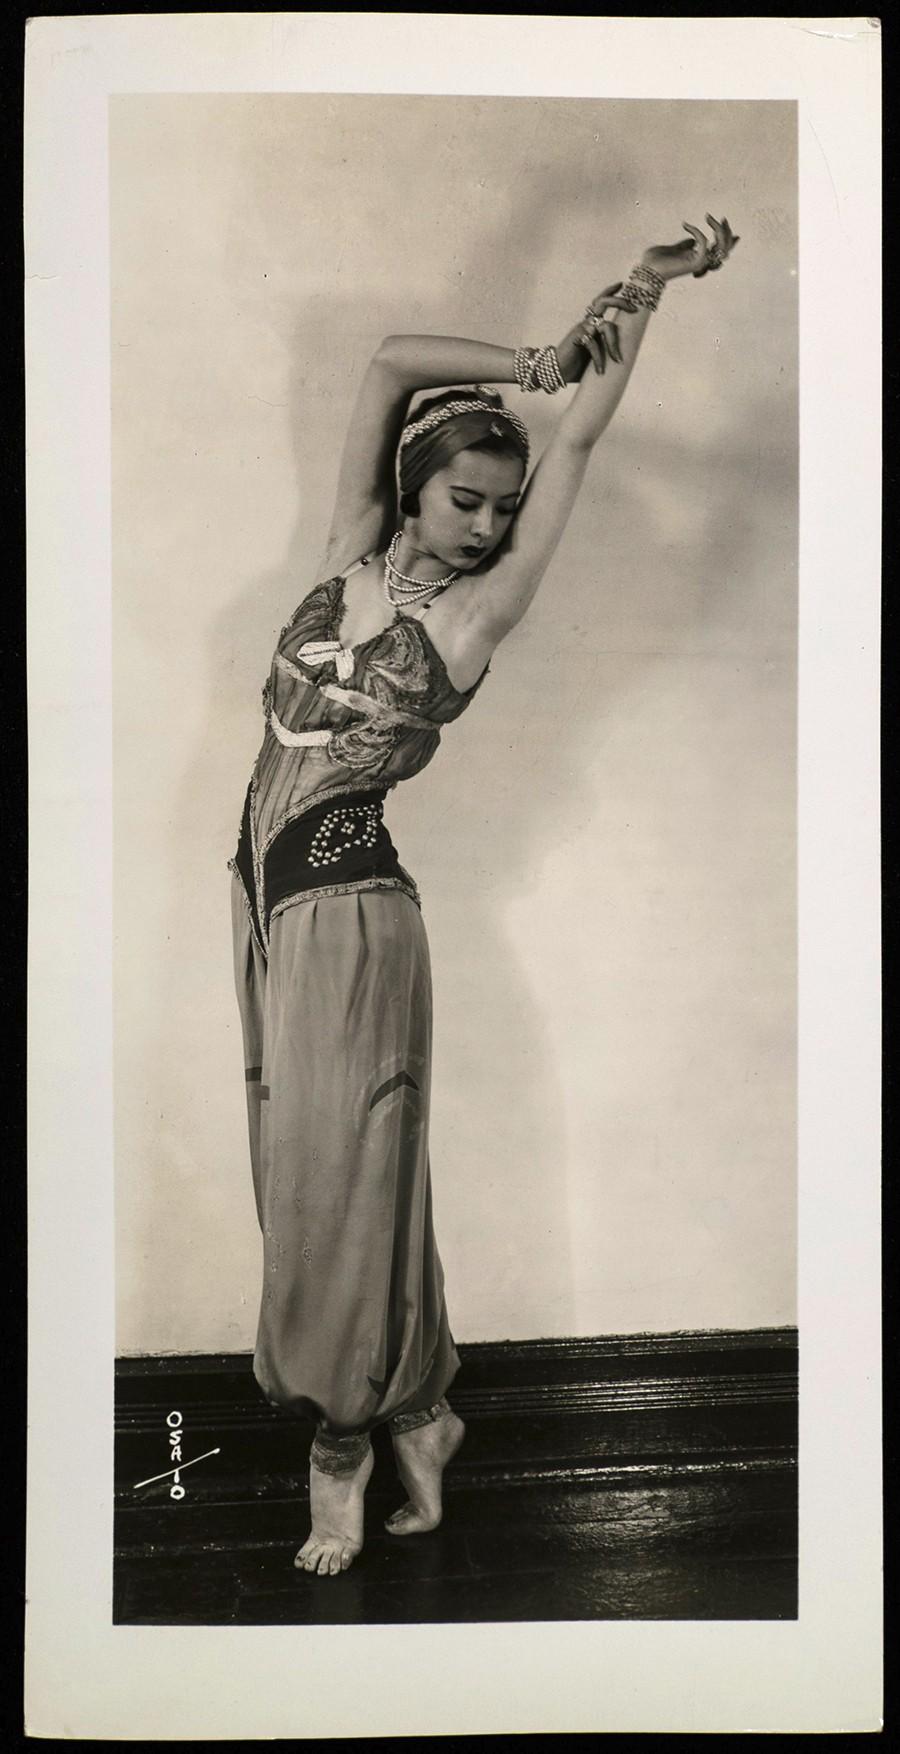 Sono Osato recreates her solo part as Scheherazade's chief concubine in in her father's Chicago photo studio.